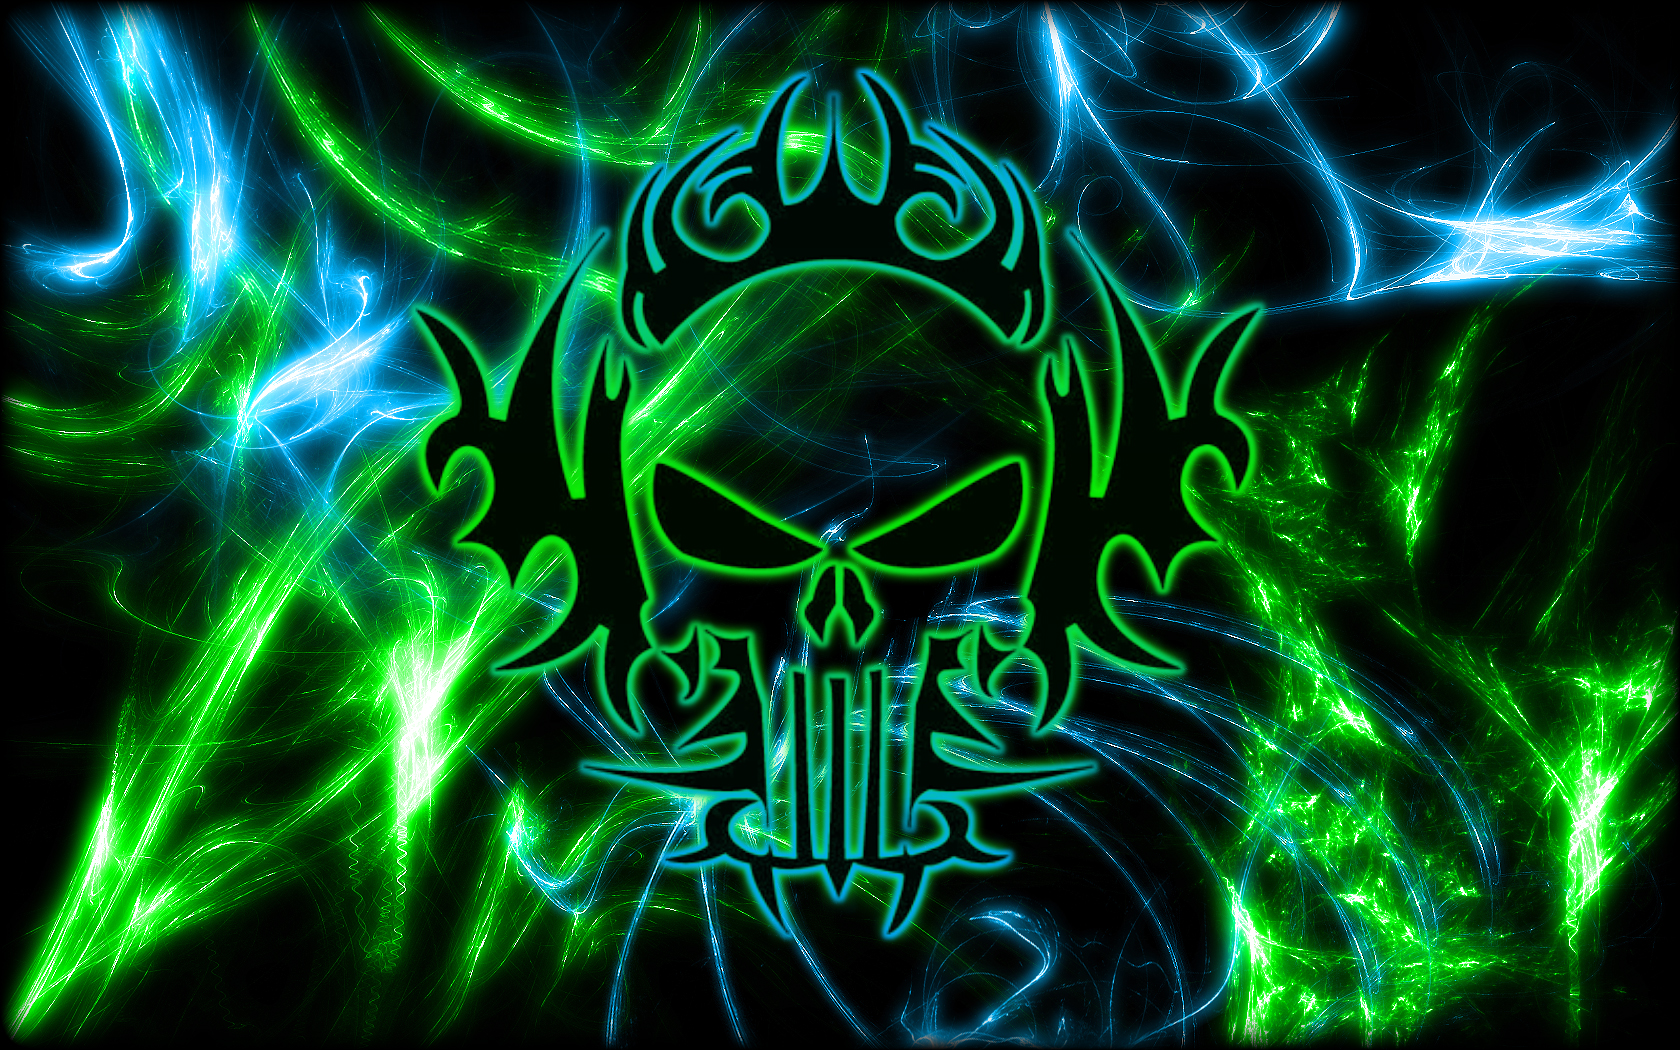 неон маска neon mask  № 2321289 бесплатно